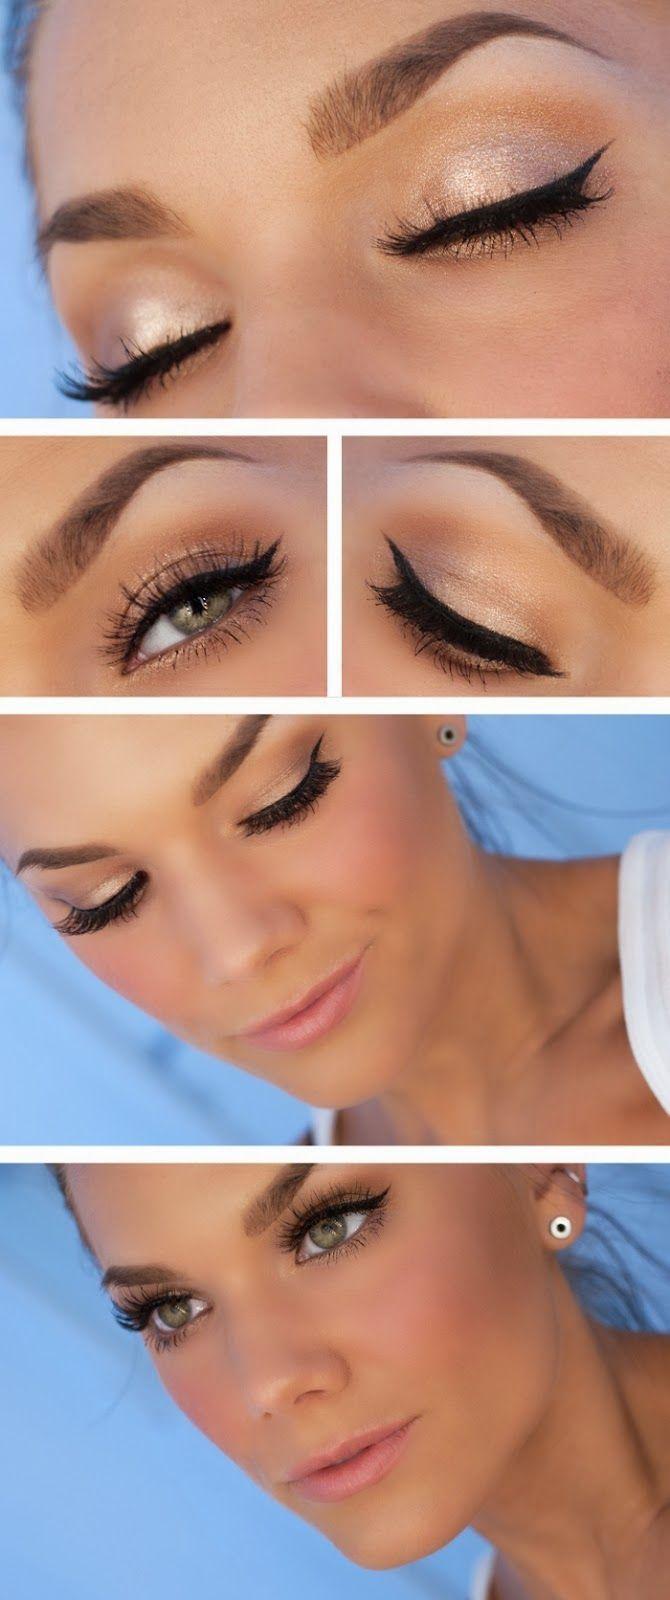 1c325ac90e28ffb1c95b65957de22858 - maquillaje natural mejores equipos